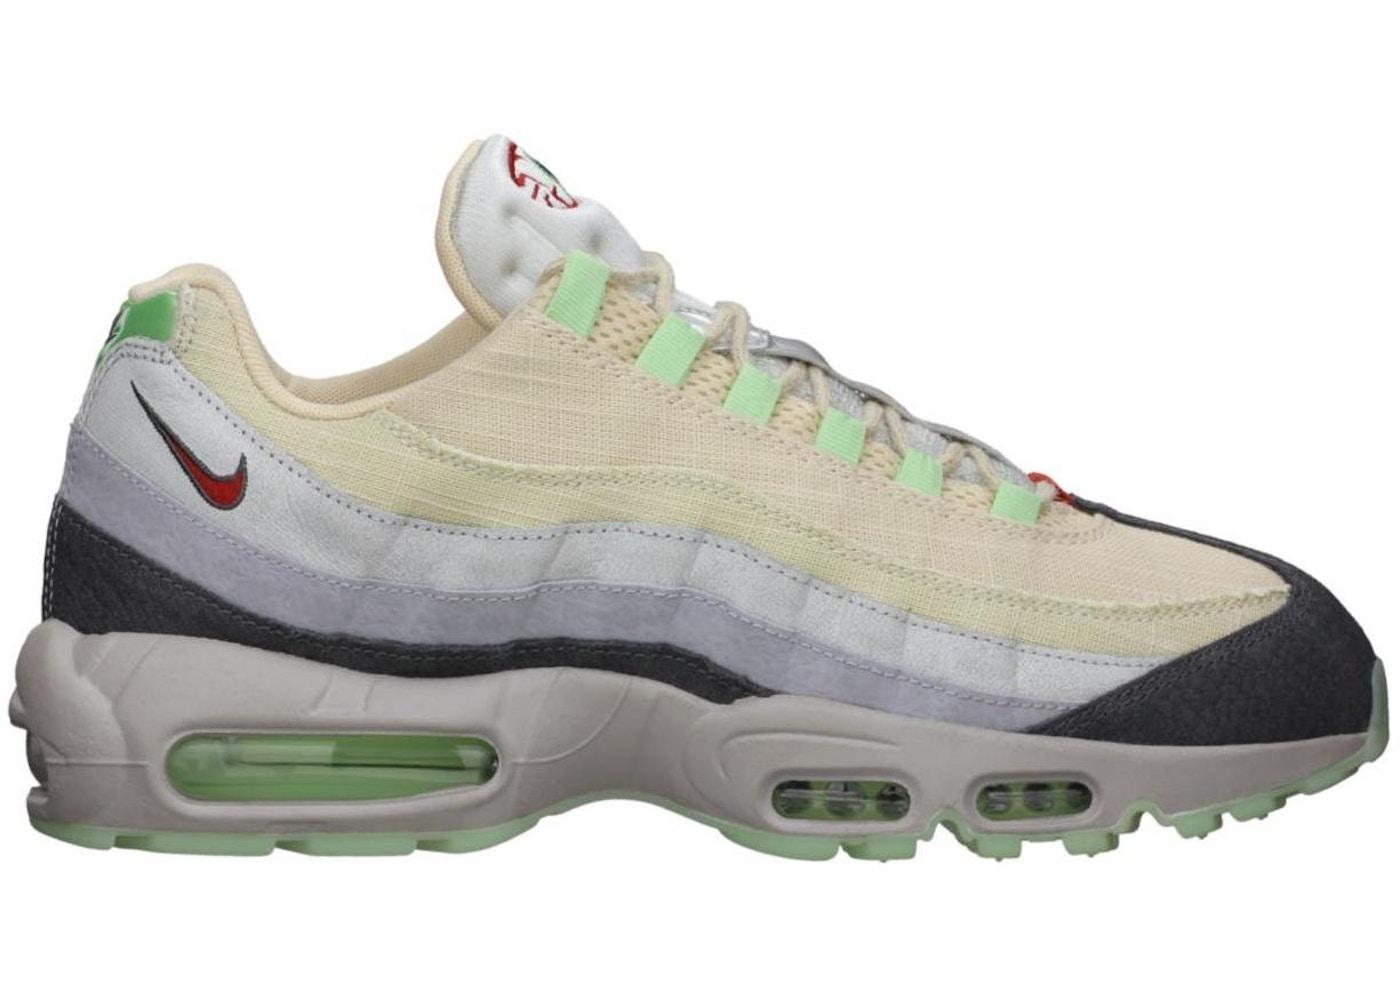 58f587428e0a6f Nike Air Max 95 Shoes - Price Premium